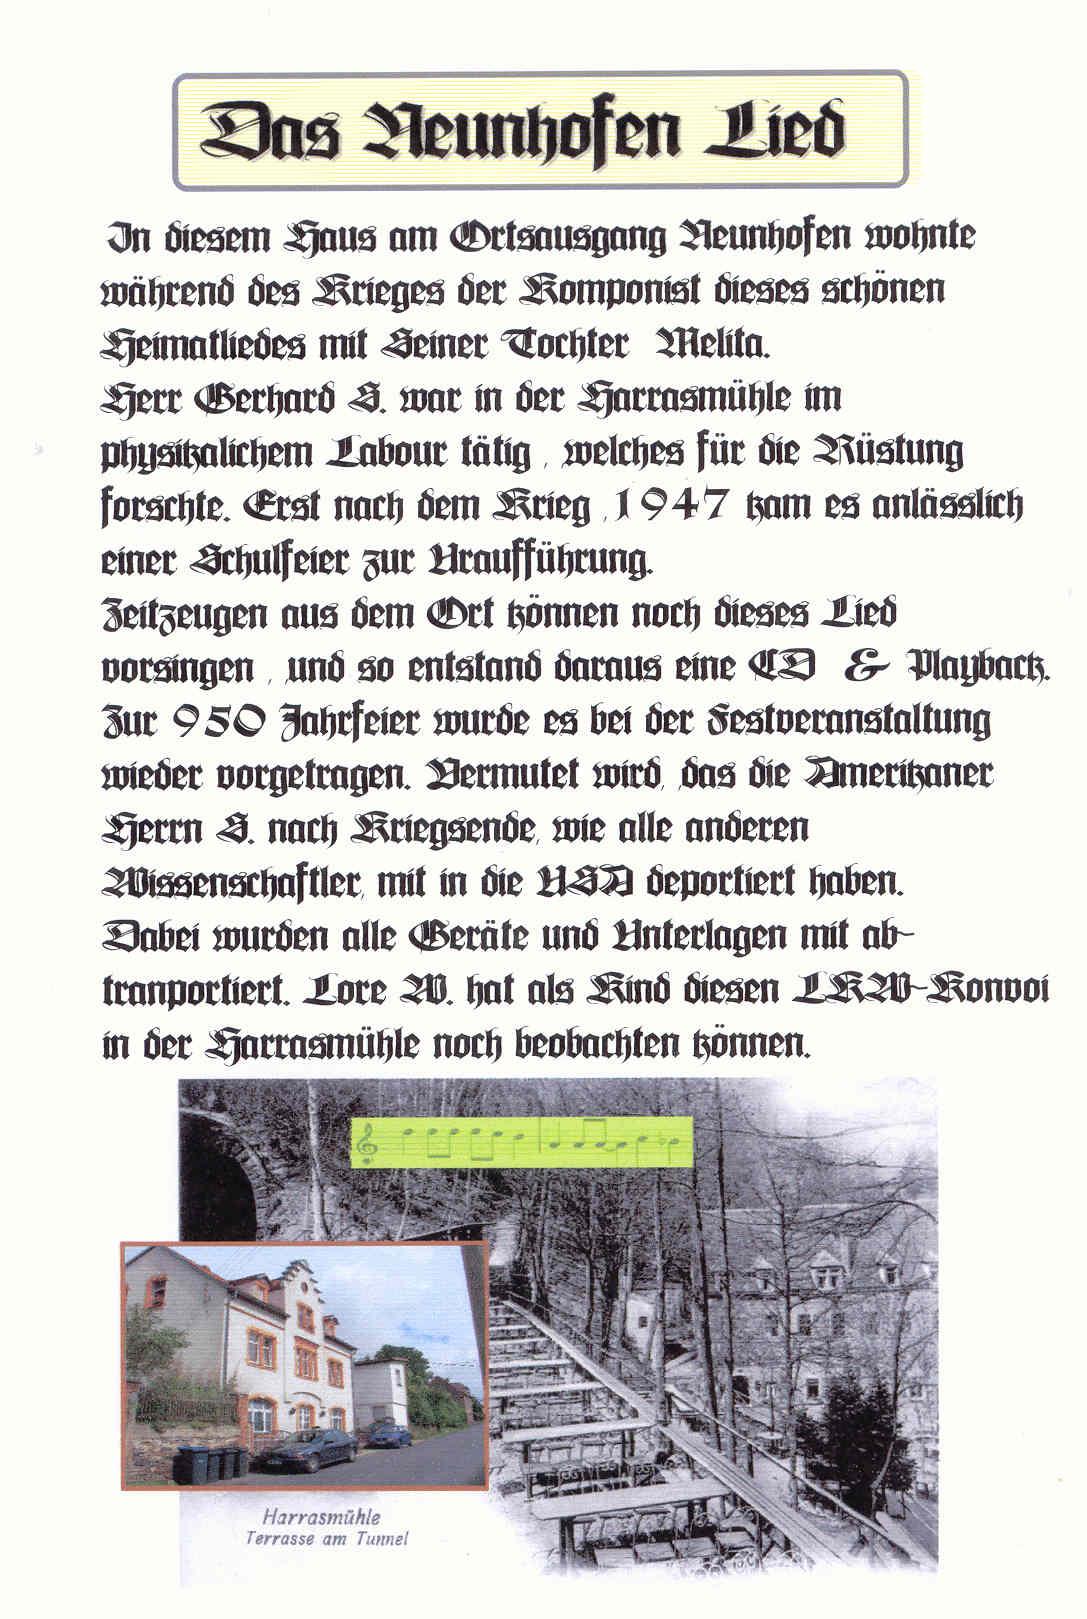 729neunhofenlied komponist .jpg - 194.76 KB